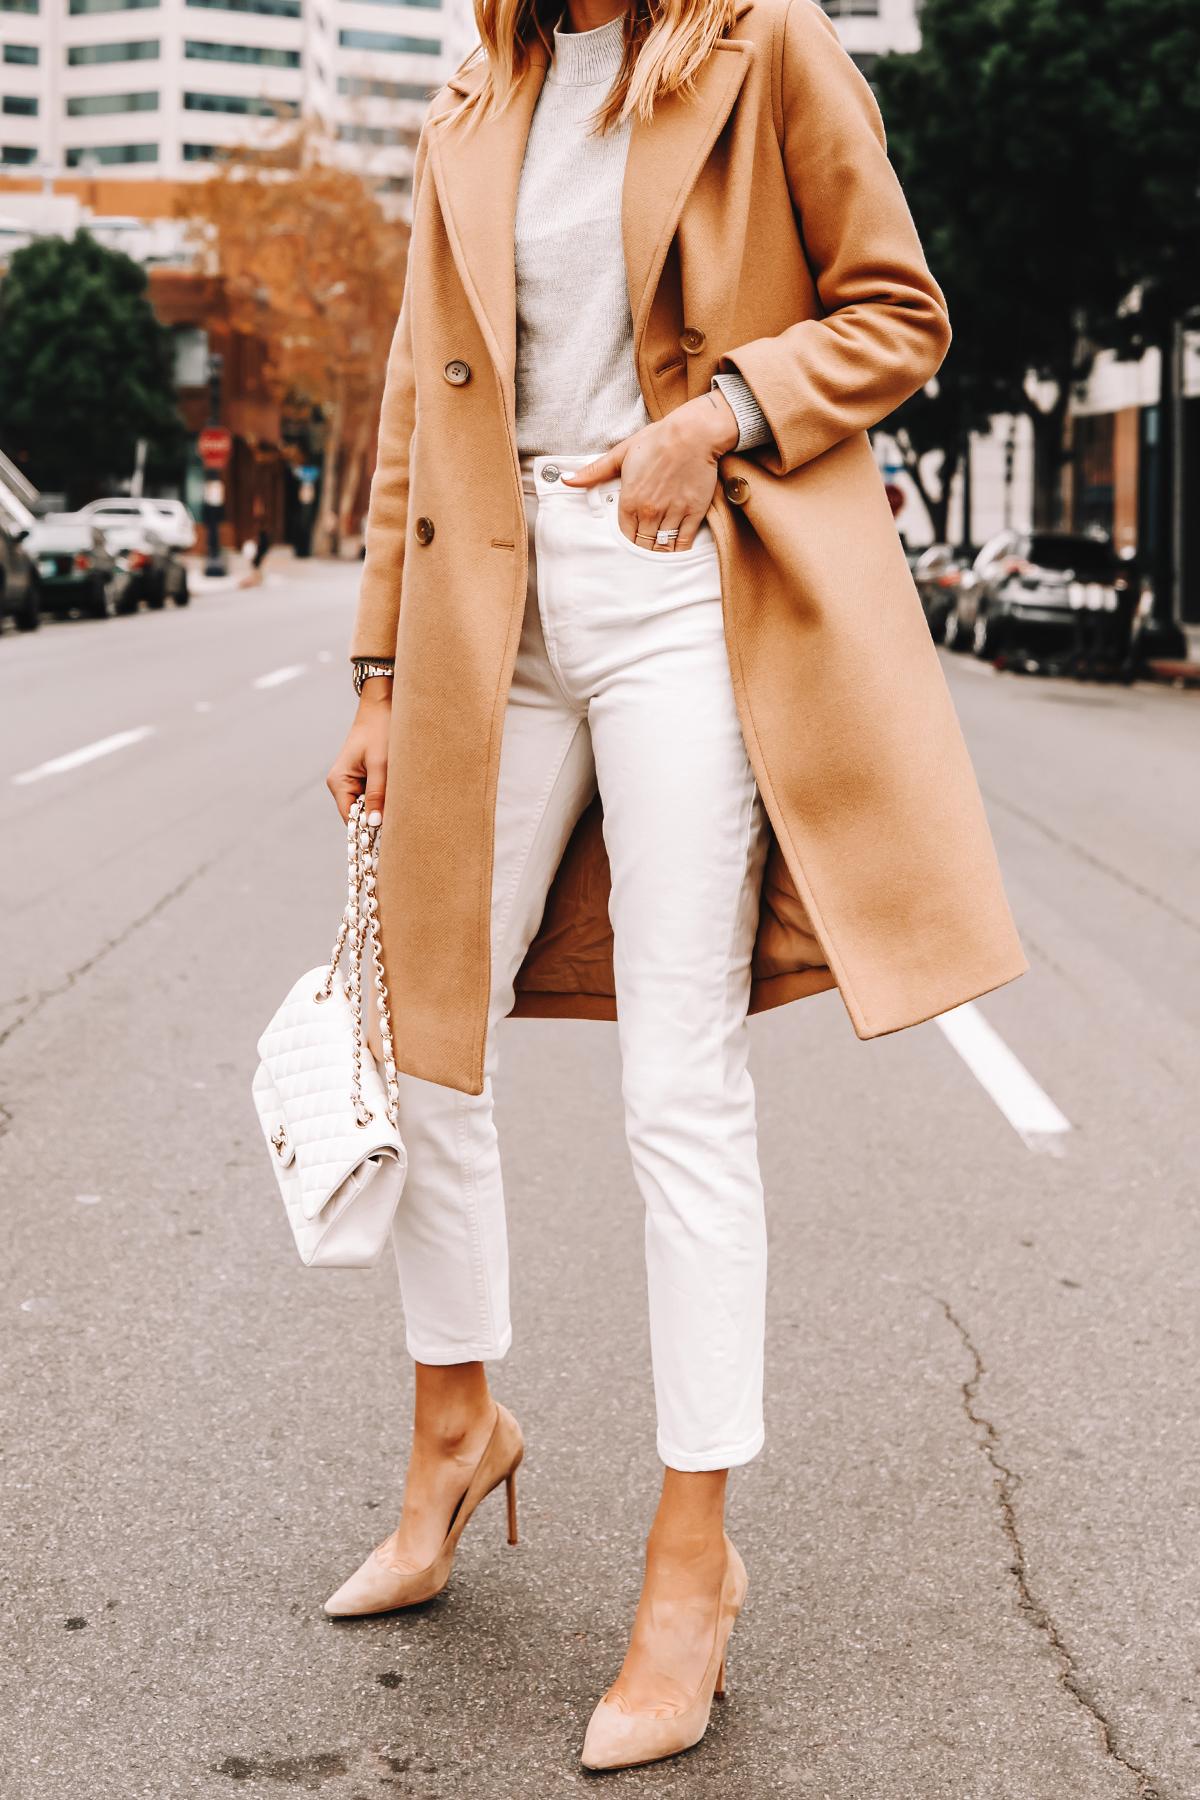 Fashion Jackson Wearing Everlane Camel Coat Grey Sweater White Jeans Nude Pumps White Chanel Handbag 2